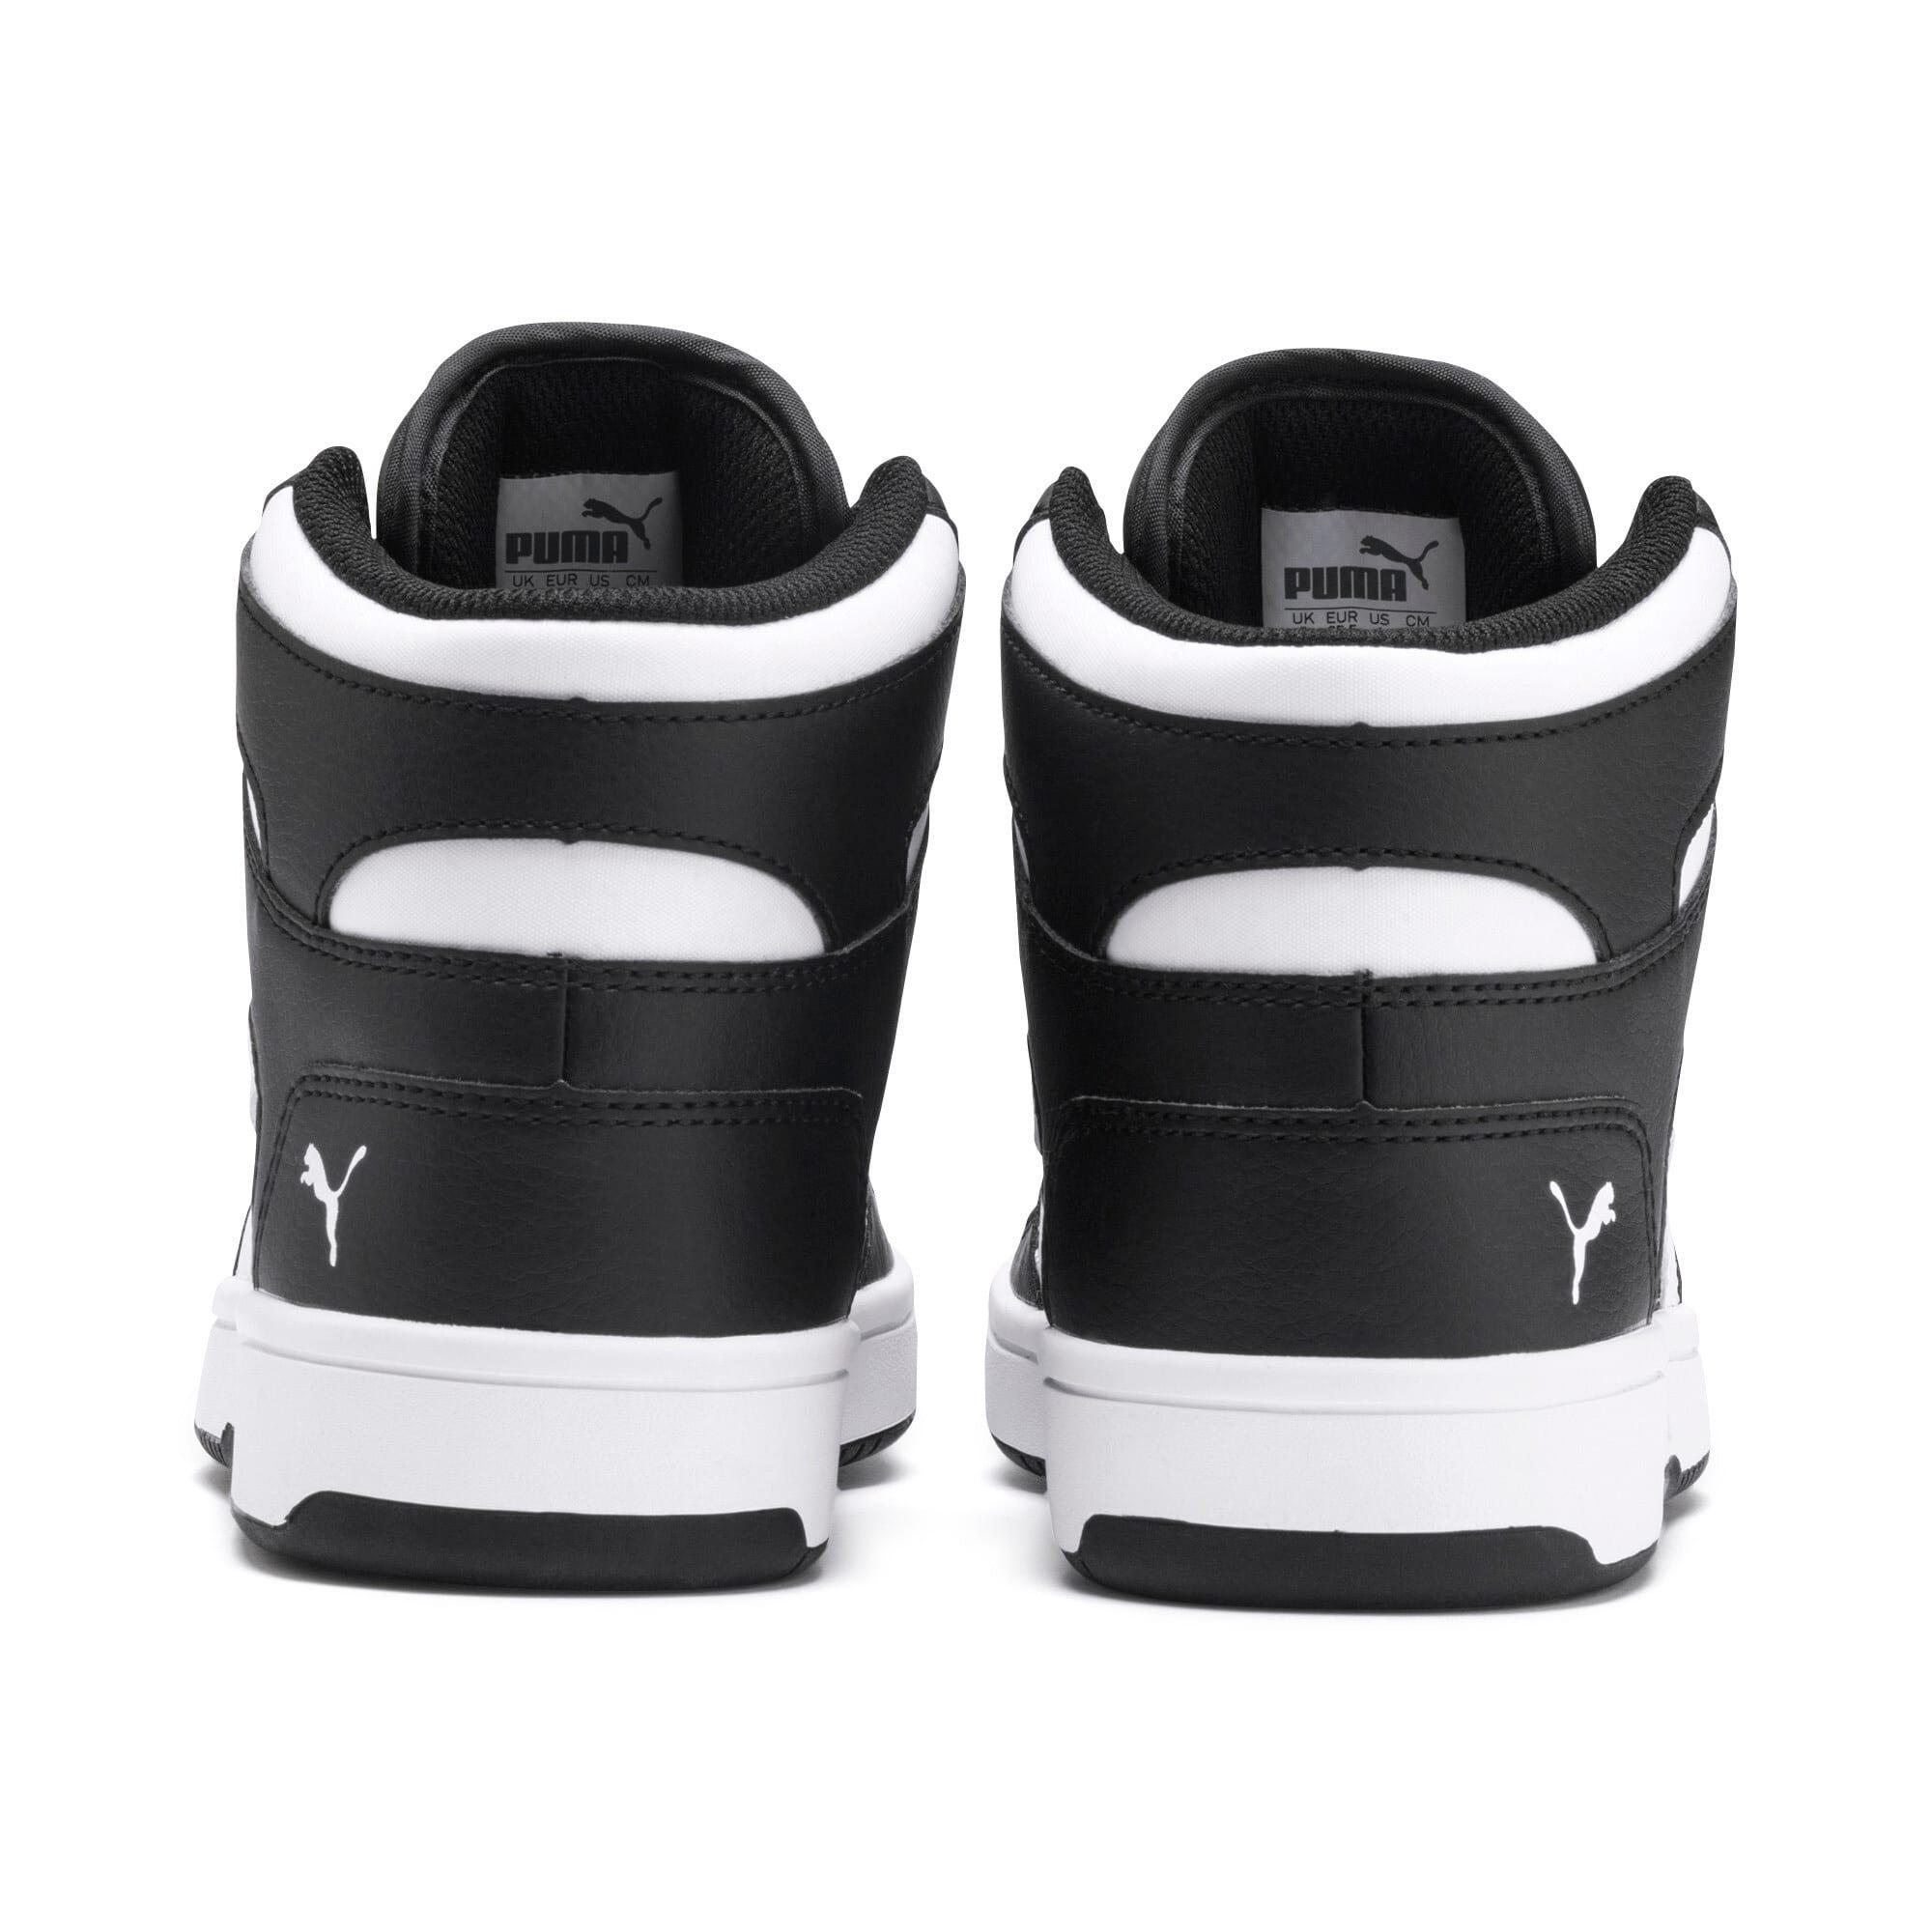 Thumbnail 3 of PUMA Rebound LayUp Mid Sneakers JR, Puma Black-Puma White, medium